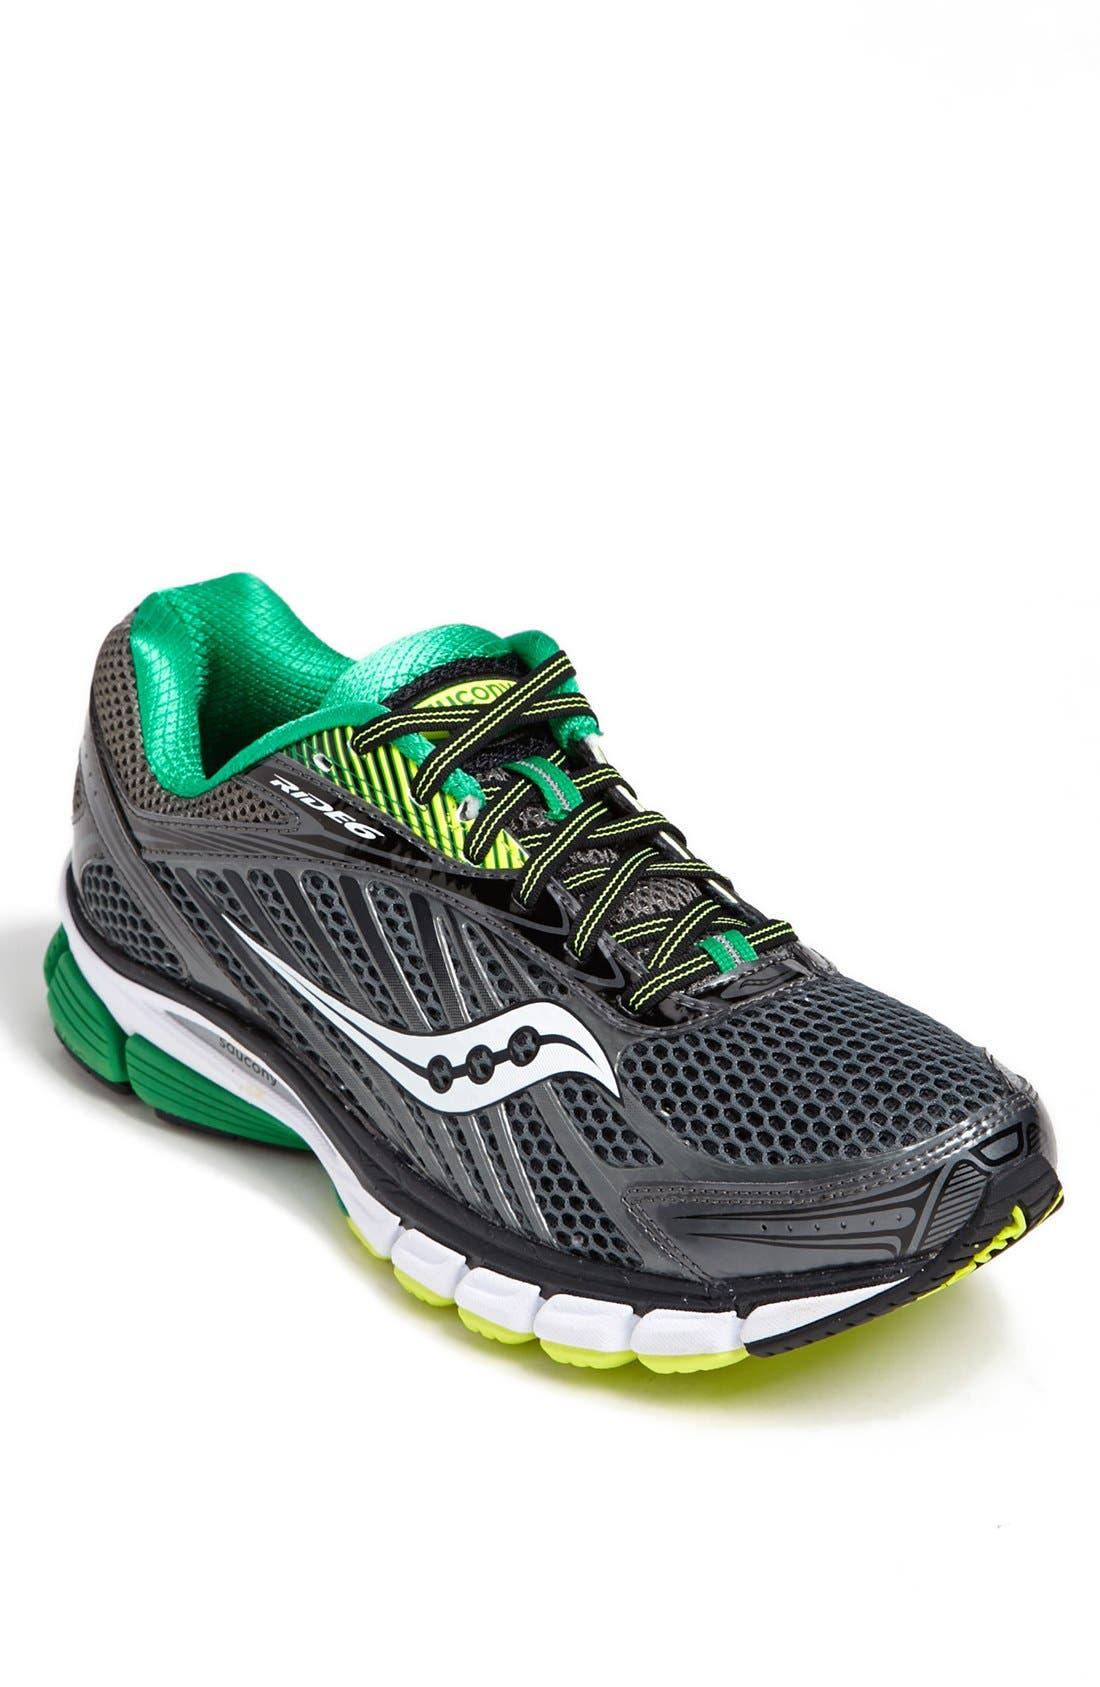 Alternate Image 1 Selected - Saucony 'Ride 6' Running Shoe (Men)